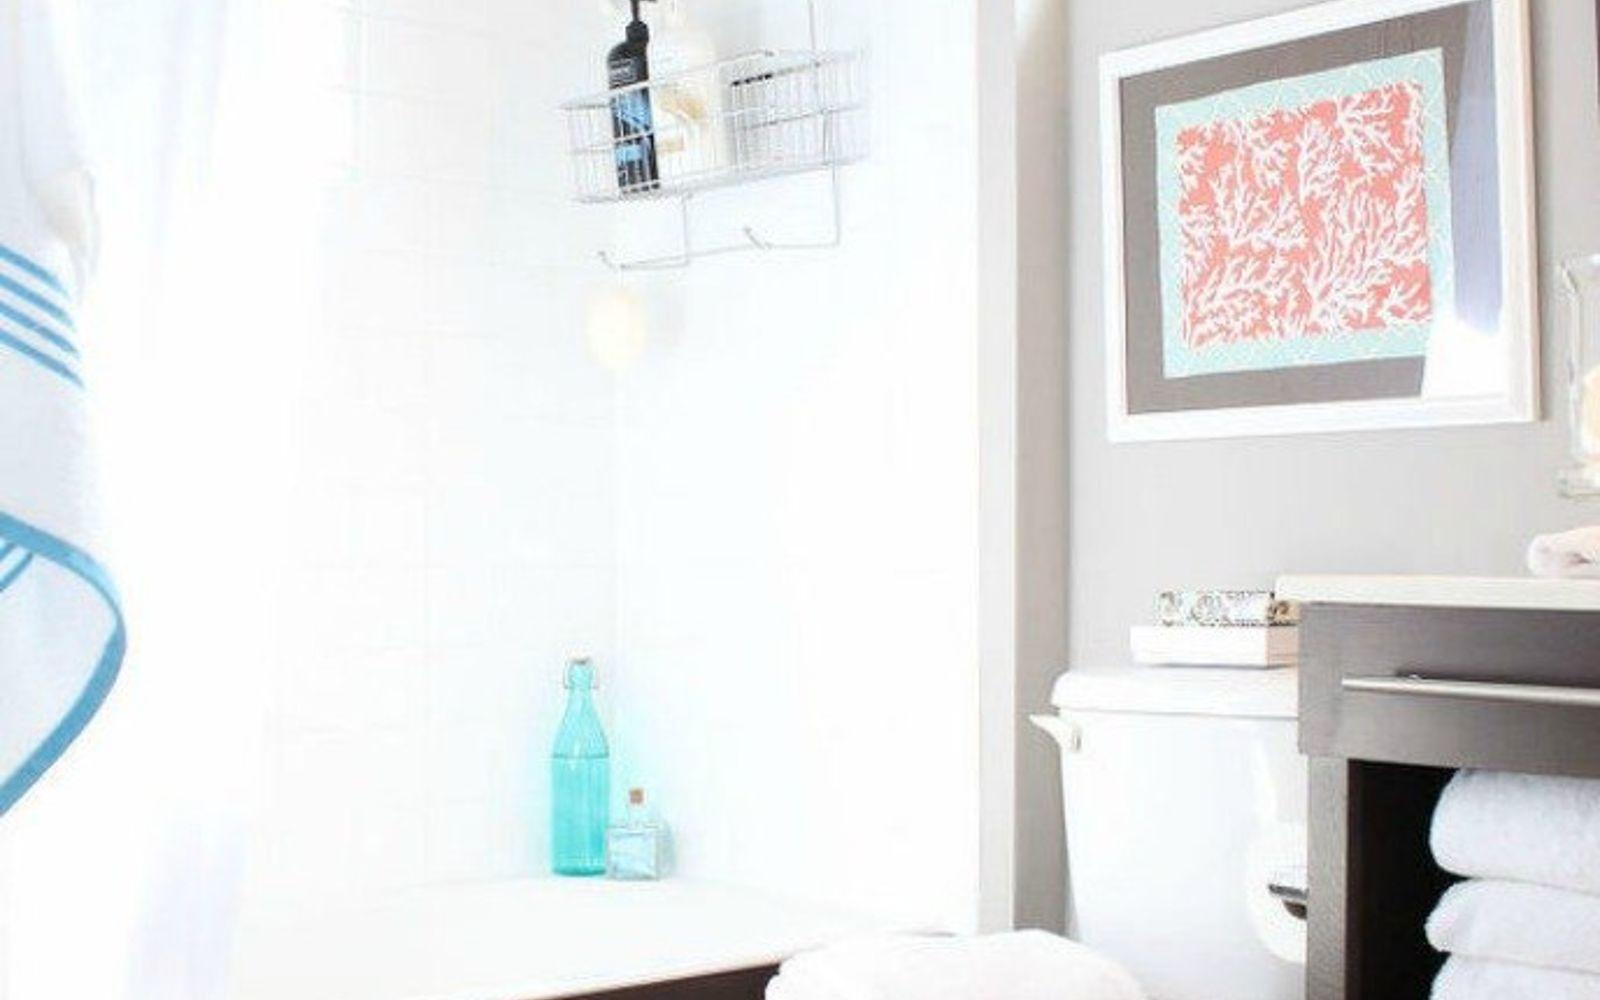 s 11 easy ways to refresh your old bathtub, bathroom ideas, Cover your bathtub side for a glam look